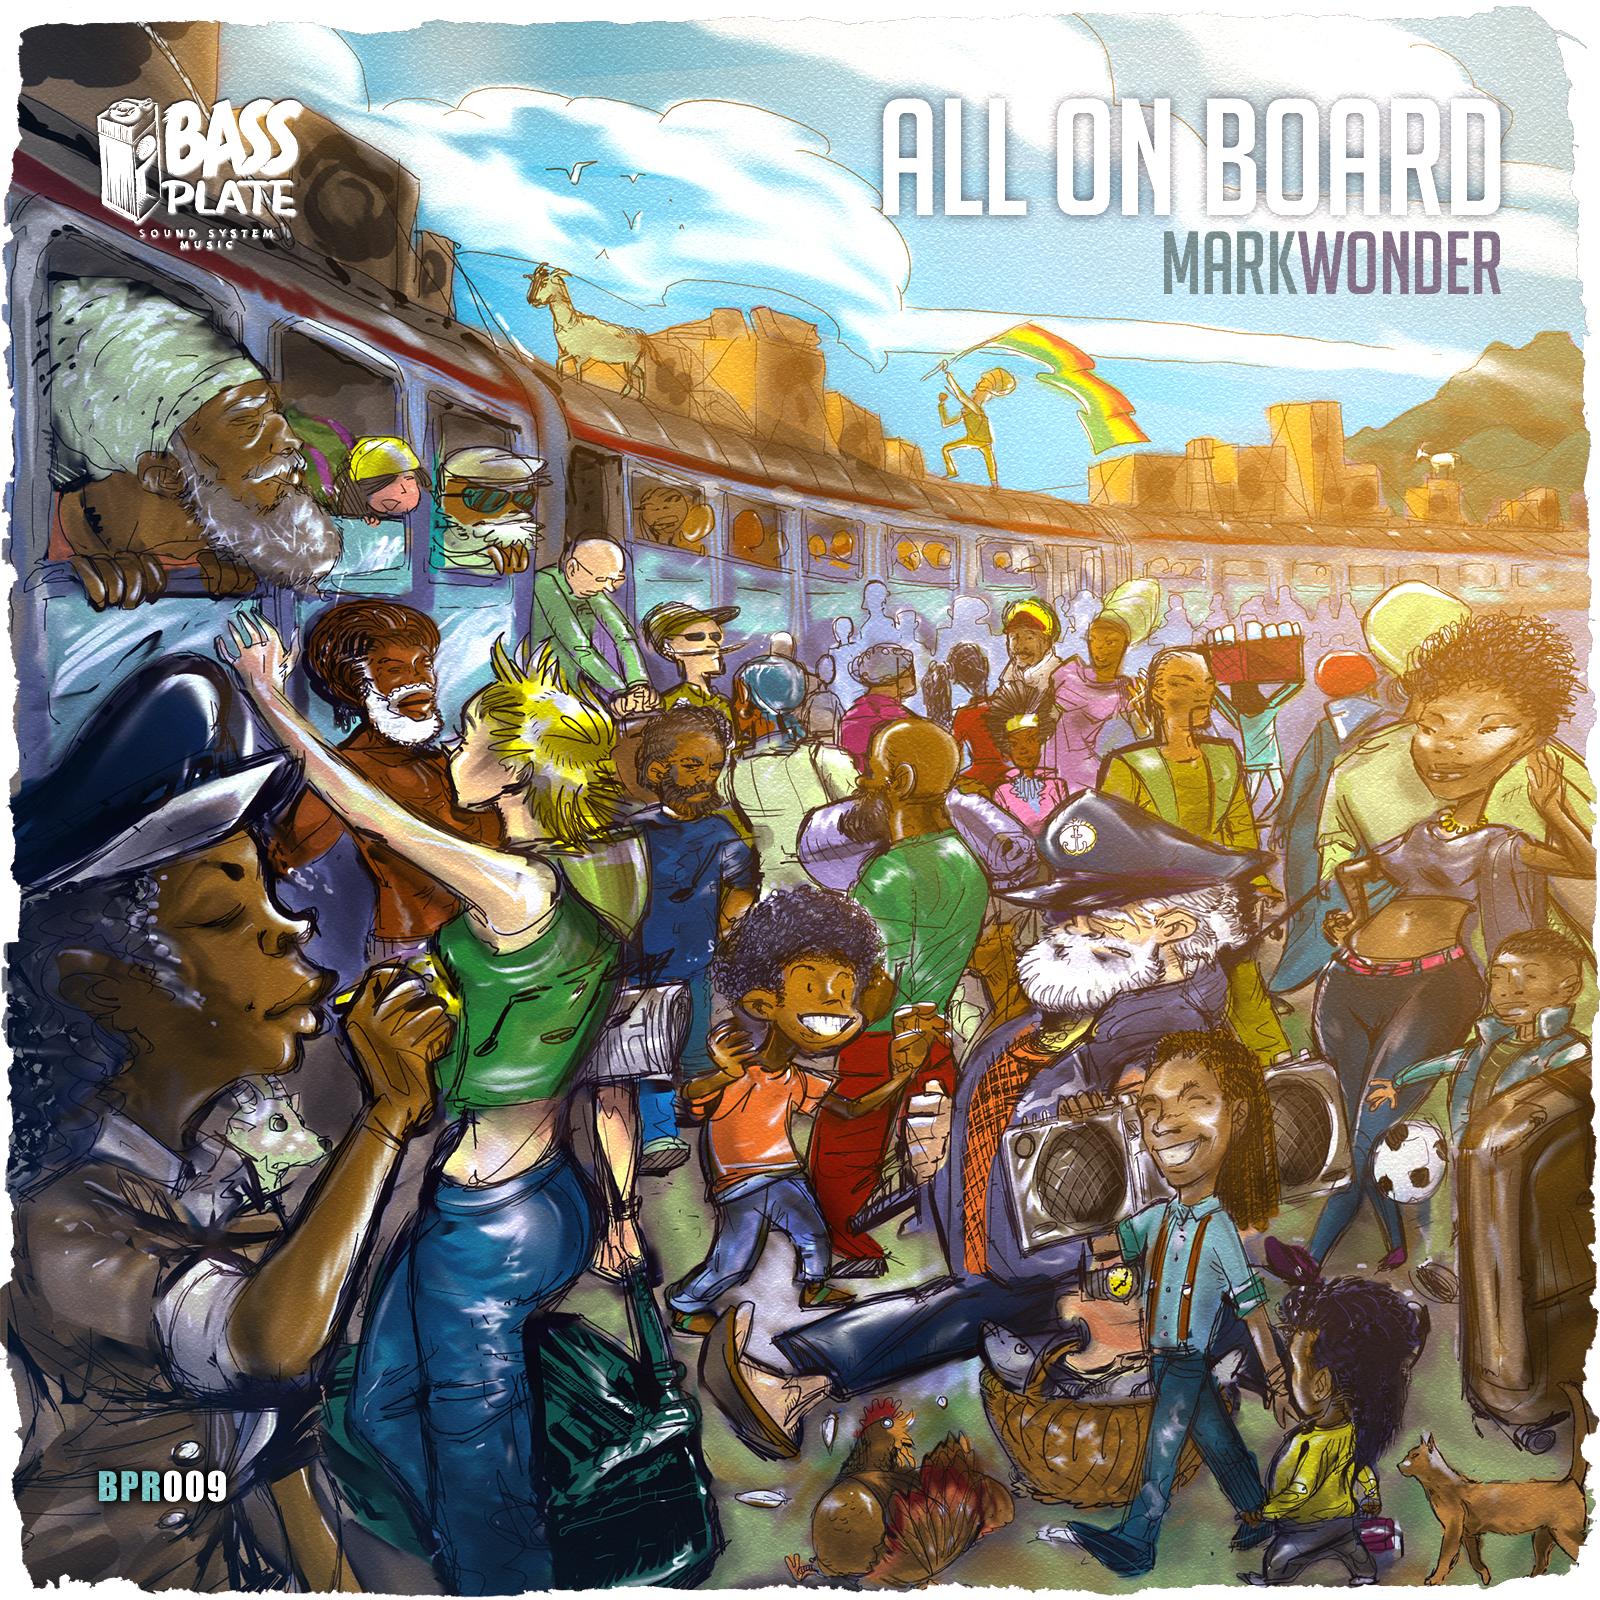 Mark Wonder - All On Board - Bassplate Records